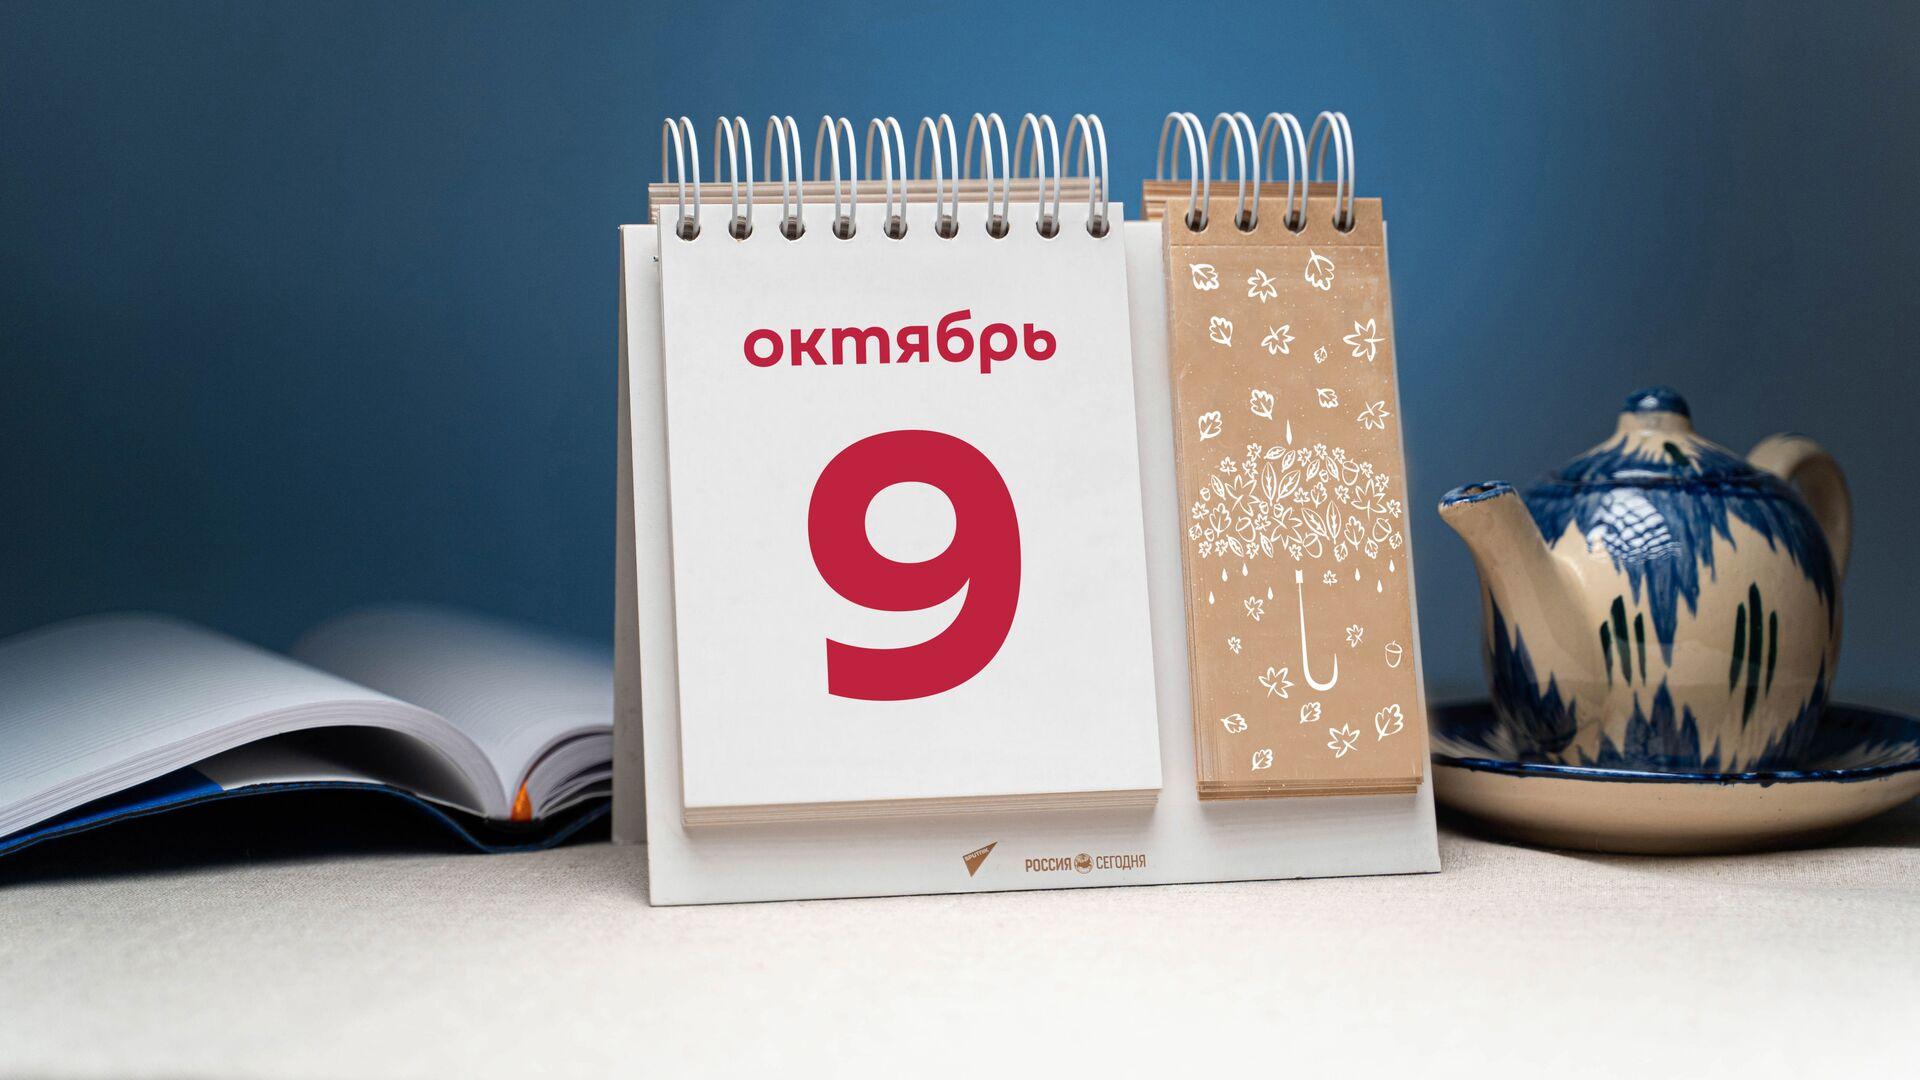 День 9 октября - Sputnik Тоҷикистон, 1920, 09.10.2021